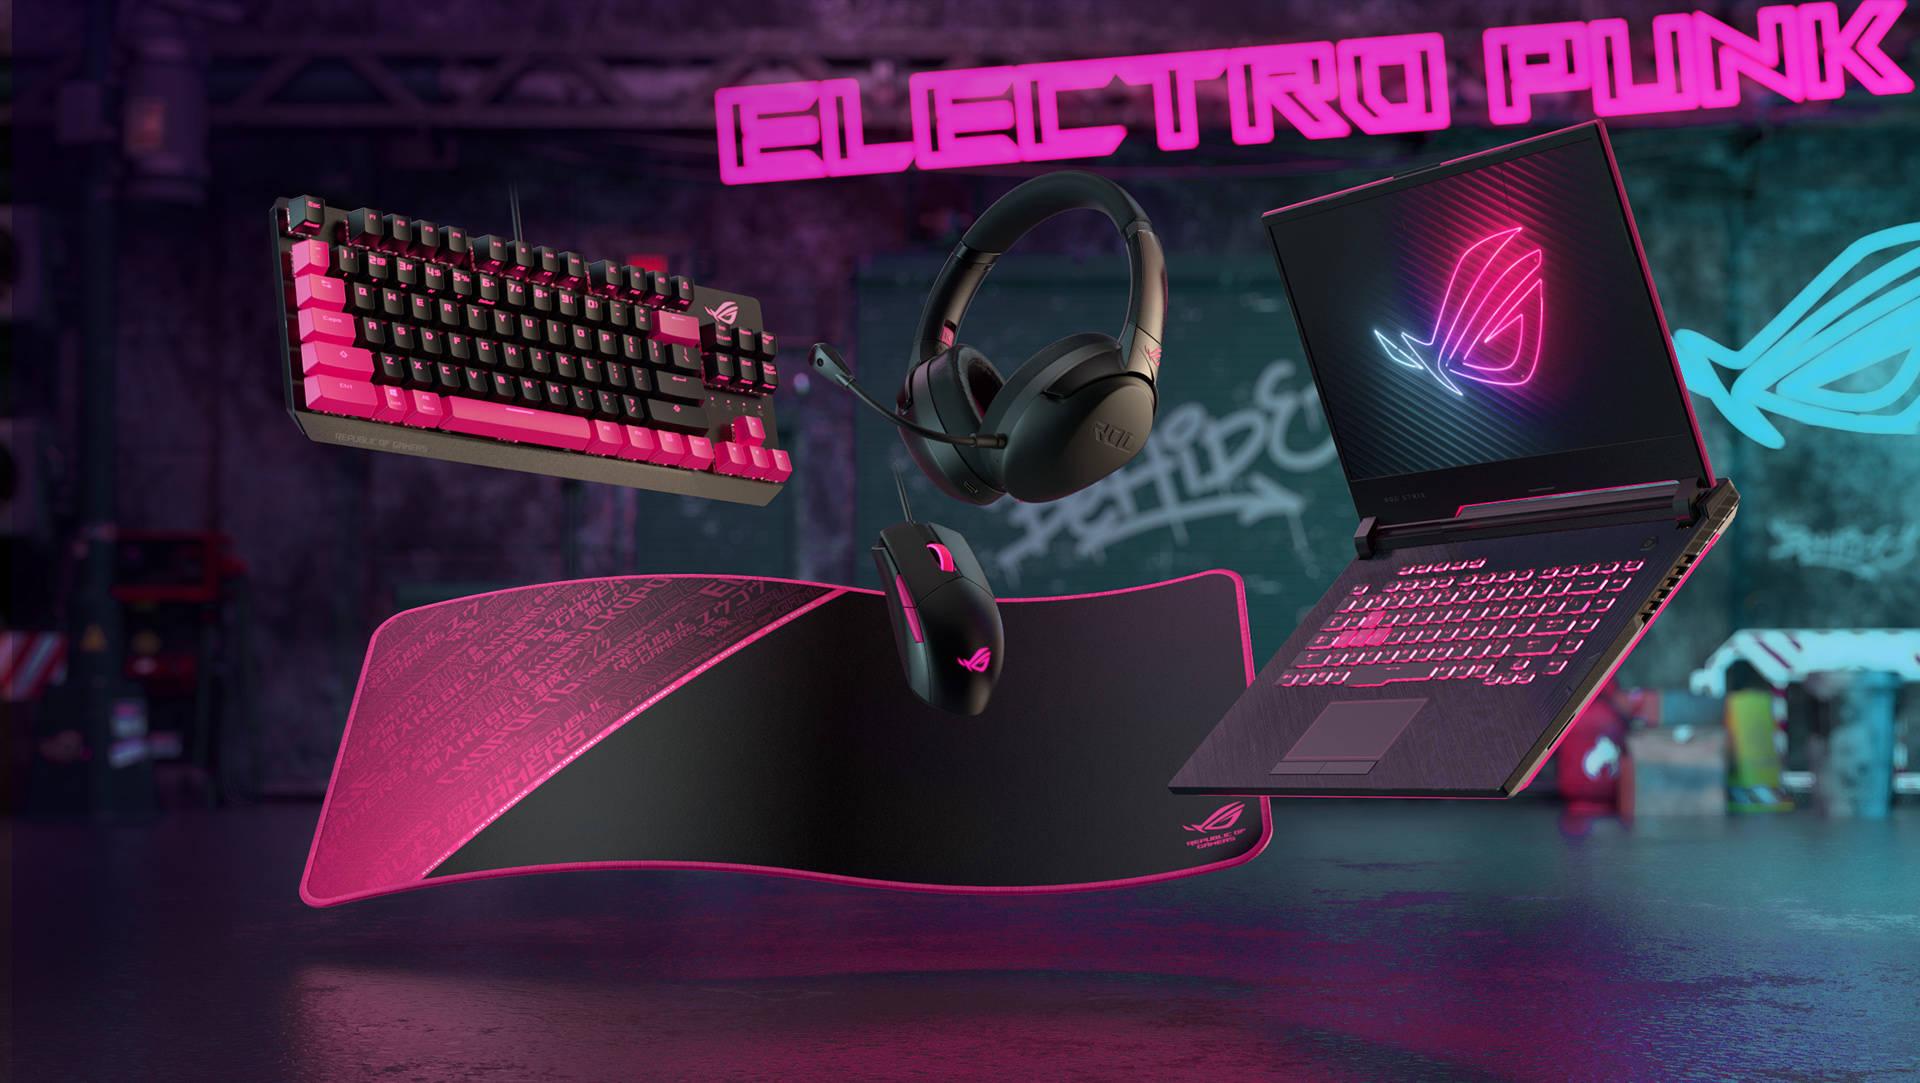 Asus Rog Strix Electro Punk